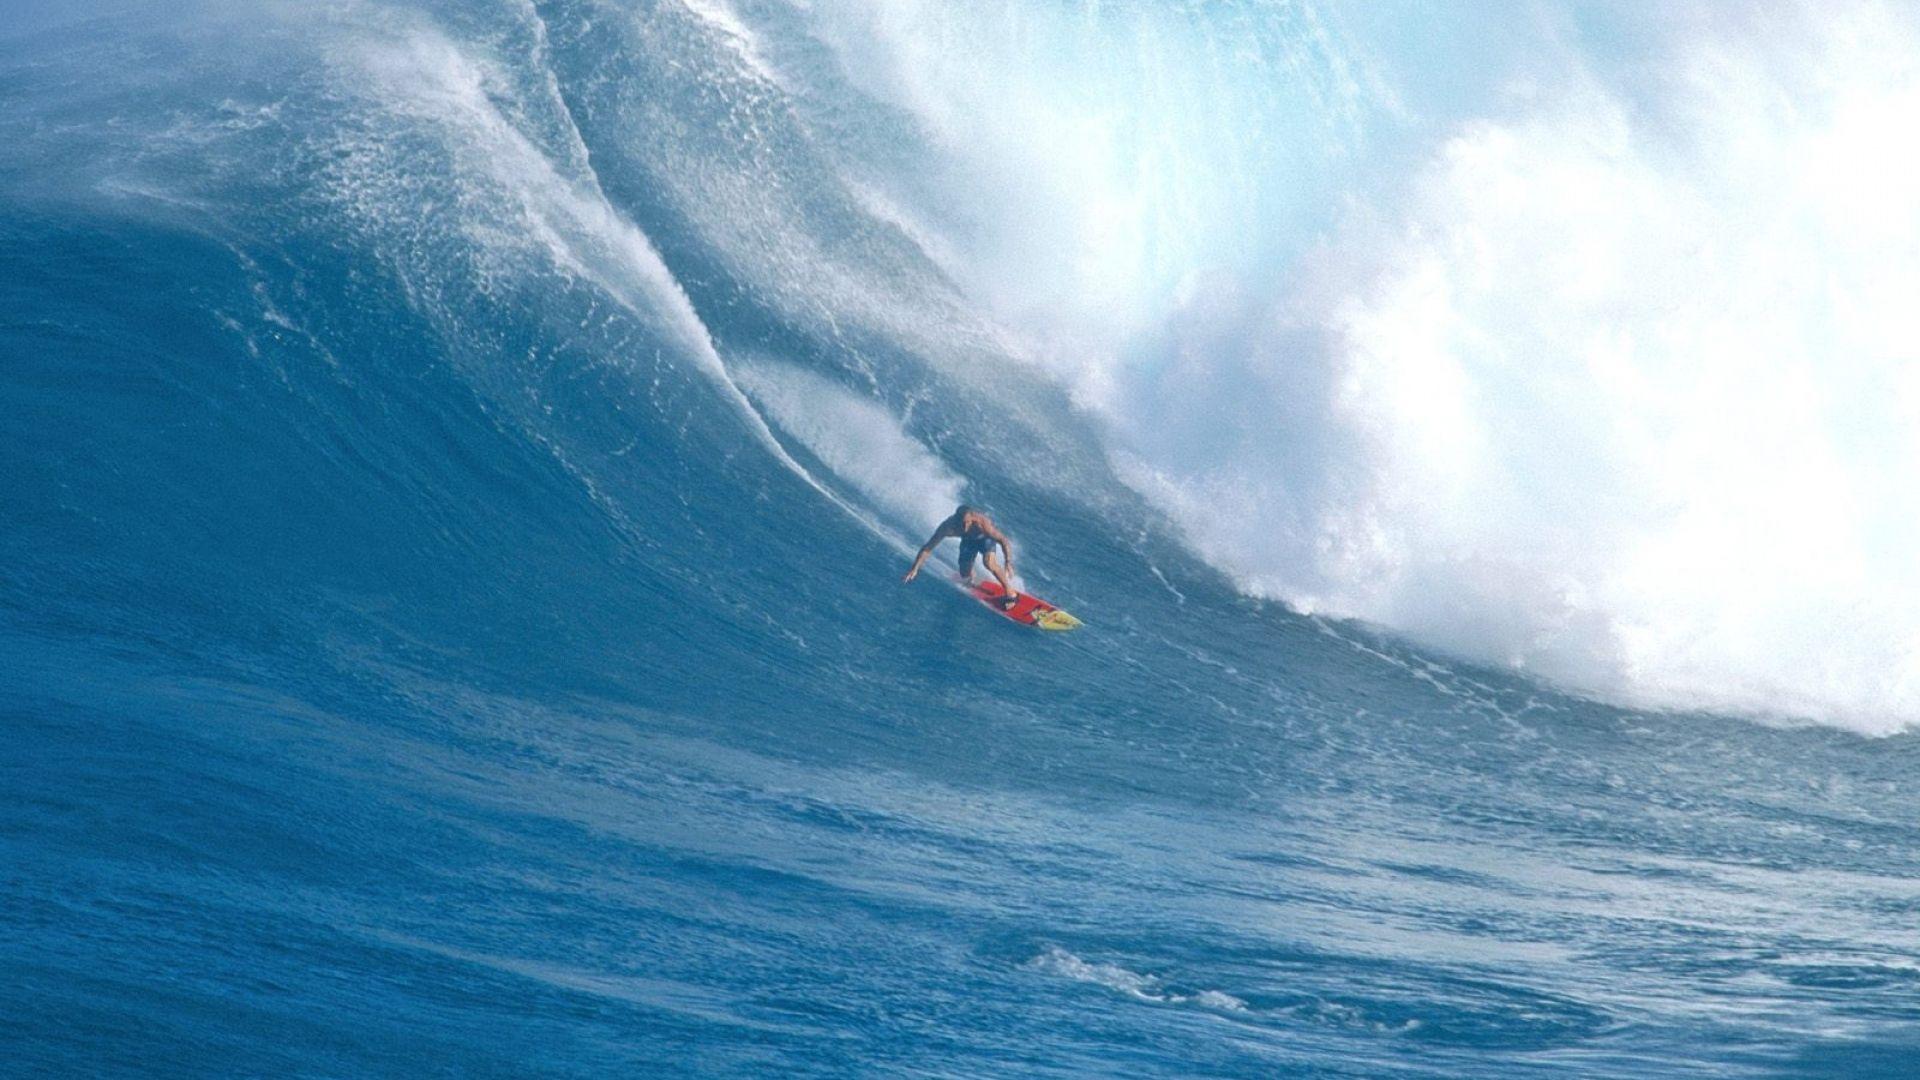 Full Hd 1080p Surfing Wallpapers Hd Desktop Backgrounds